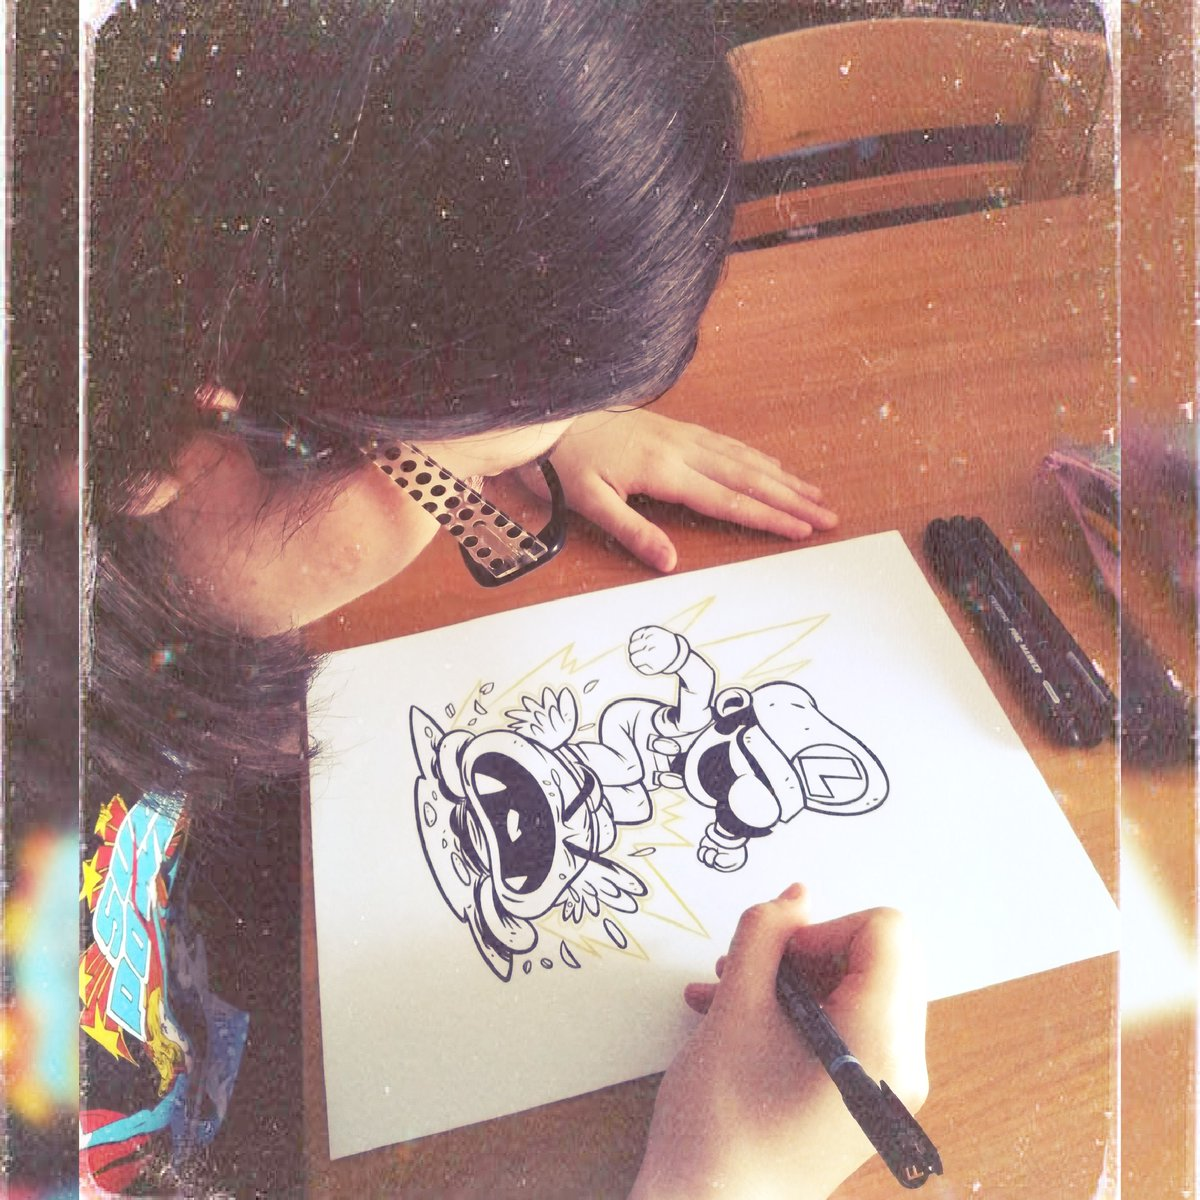 It's me inking chibi Luigi taken from Laufman's artworks!#itsme #itsmeinking  #inktime  #inkday  #inkingdrawing  #luigisupermario #chibiluigi #wednesdaymood #june17th2020 #editorphotopic.twitter.com/ntQn9QFpg4